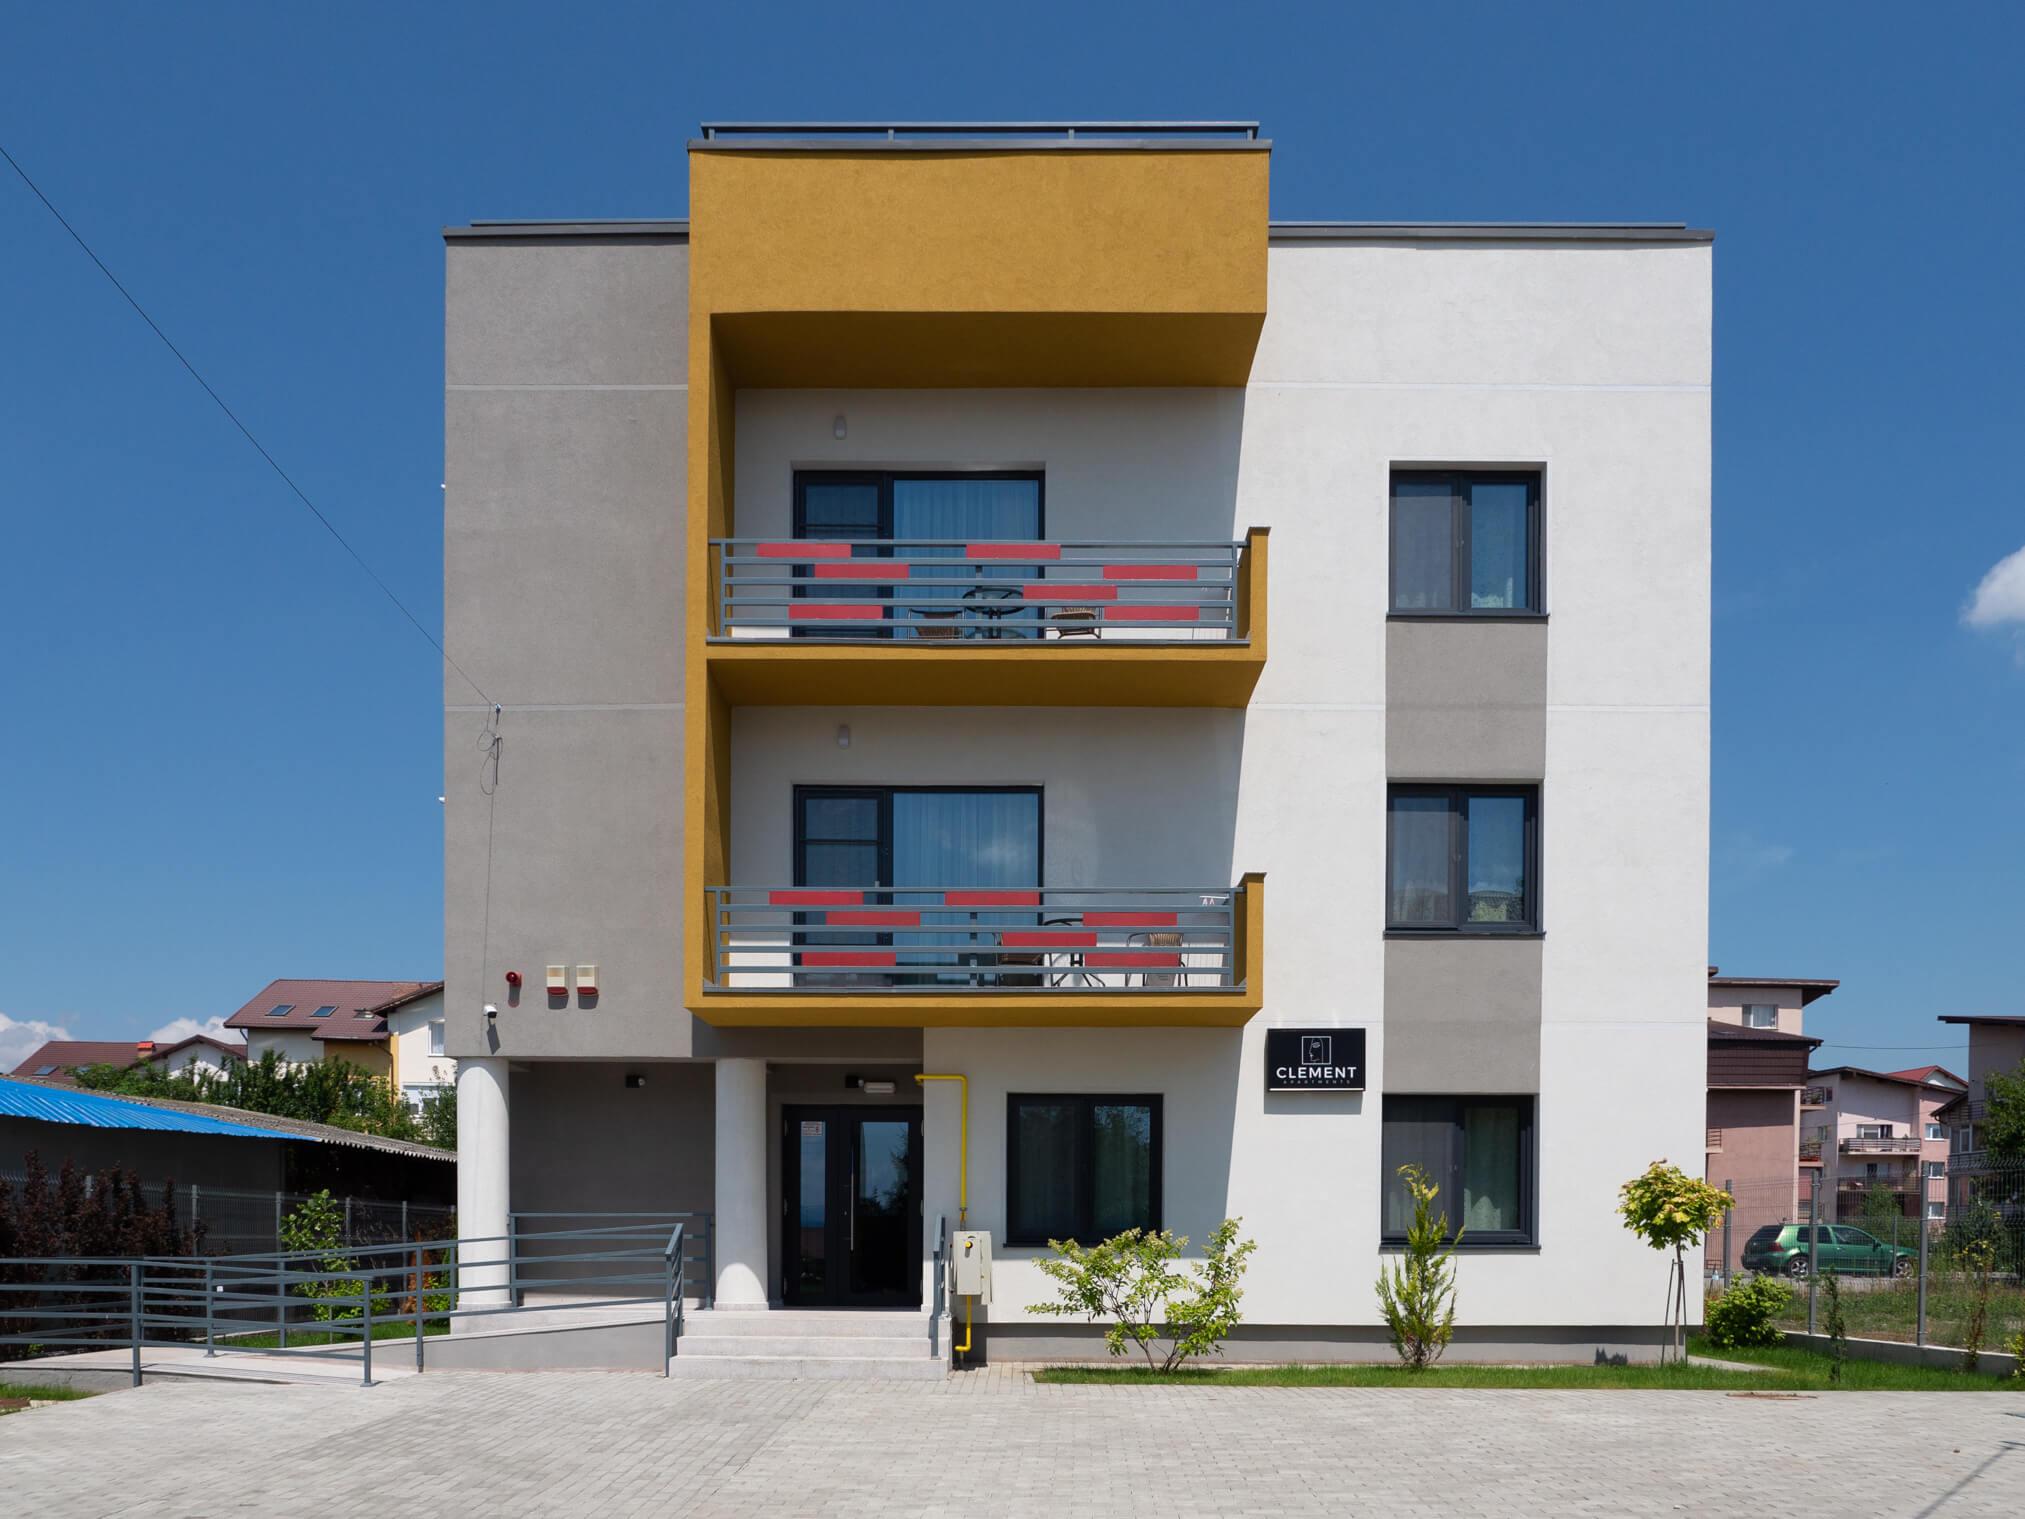 Clement aApartments - Apartamente de inchiriat in regim hotelier - cazare neamt - cazare piatra neamt (2)